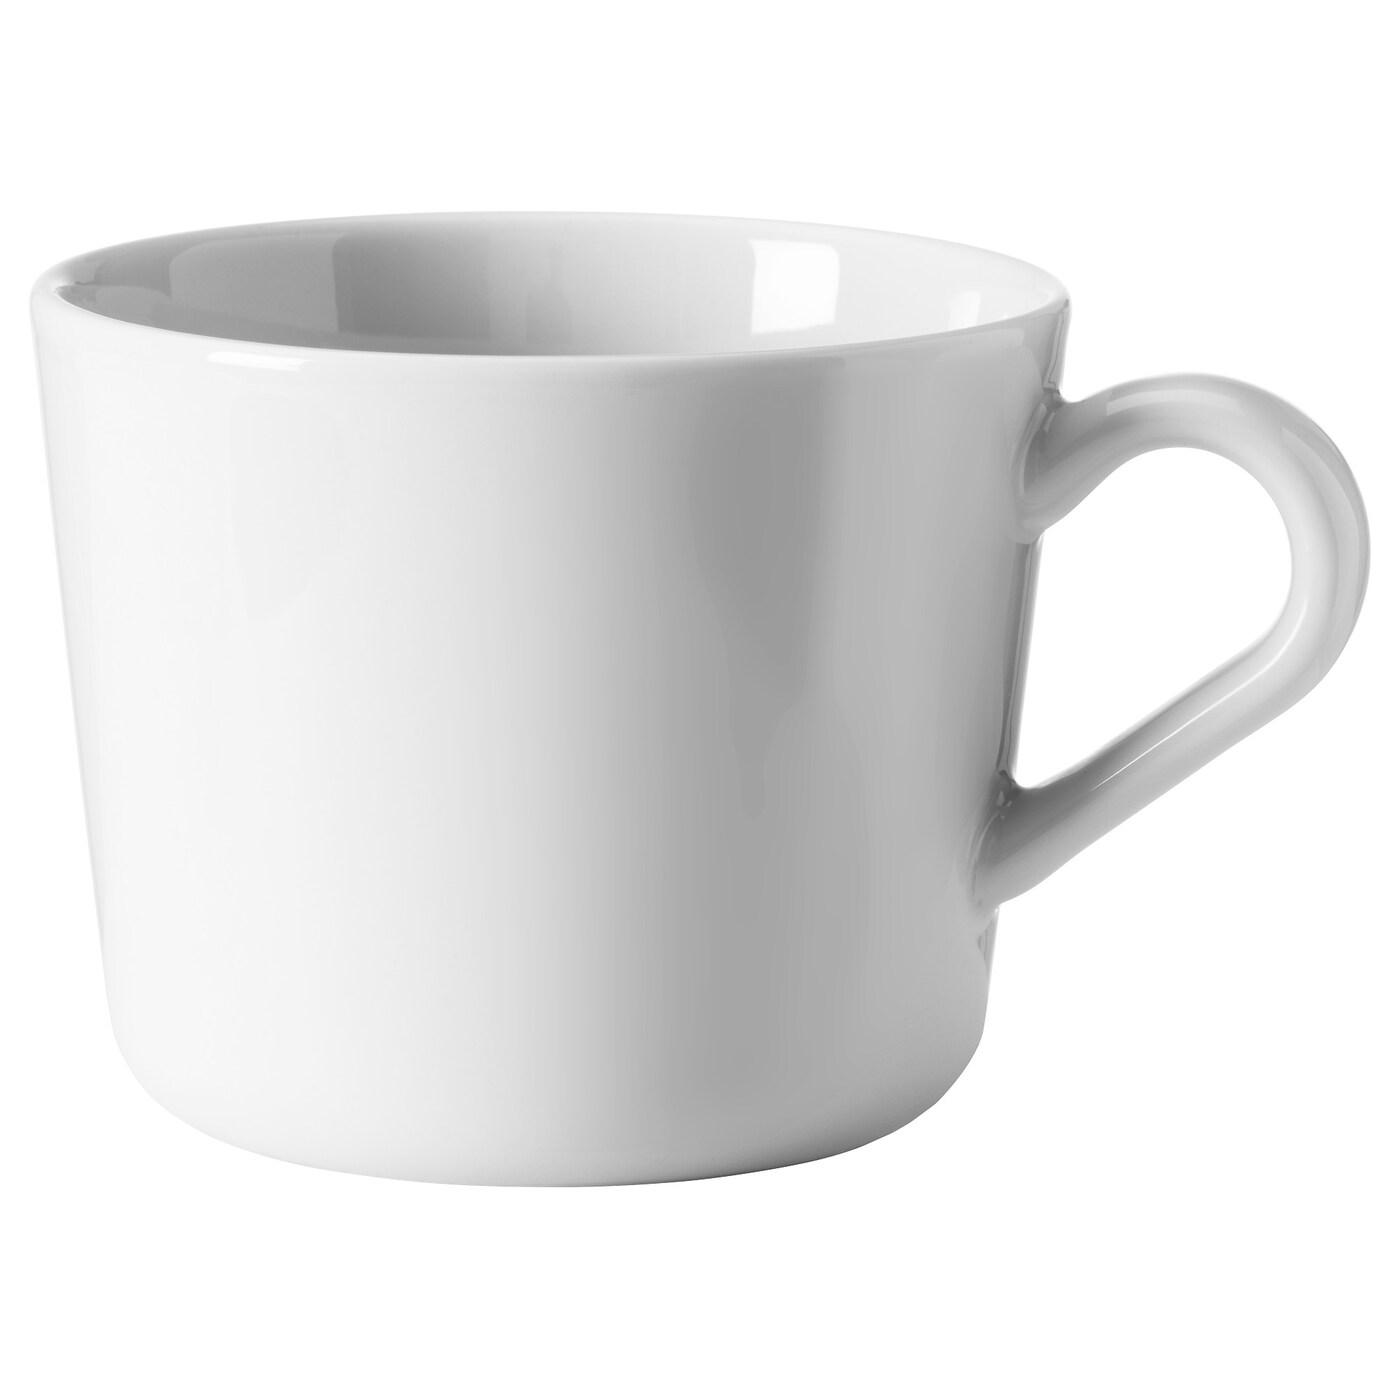 ИКЕА IKEA 365+, чашка, 202.829.42, белый, 24 сл